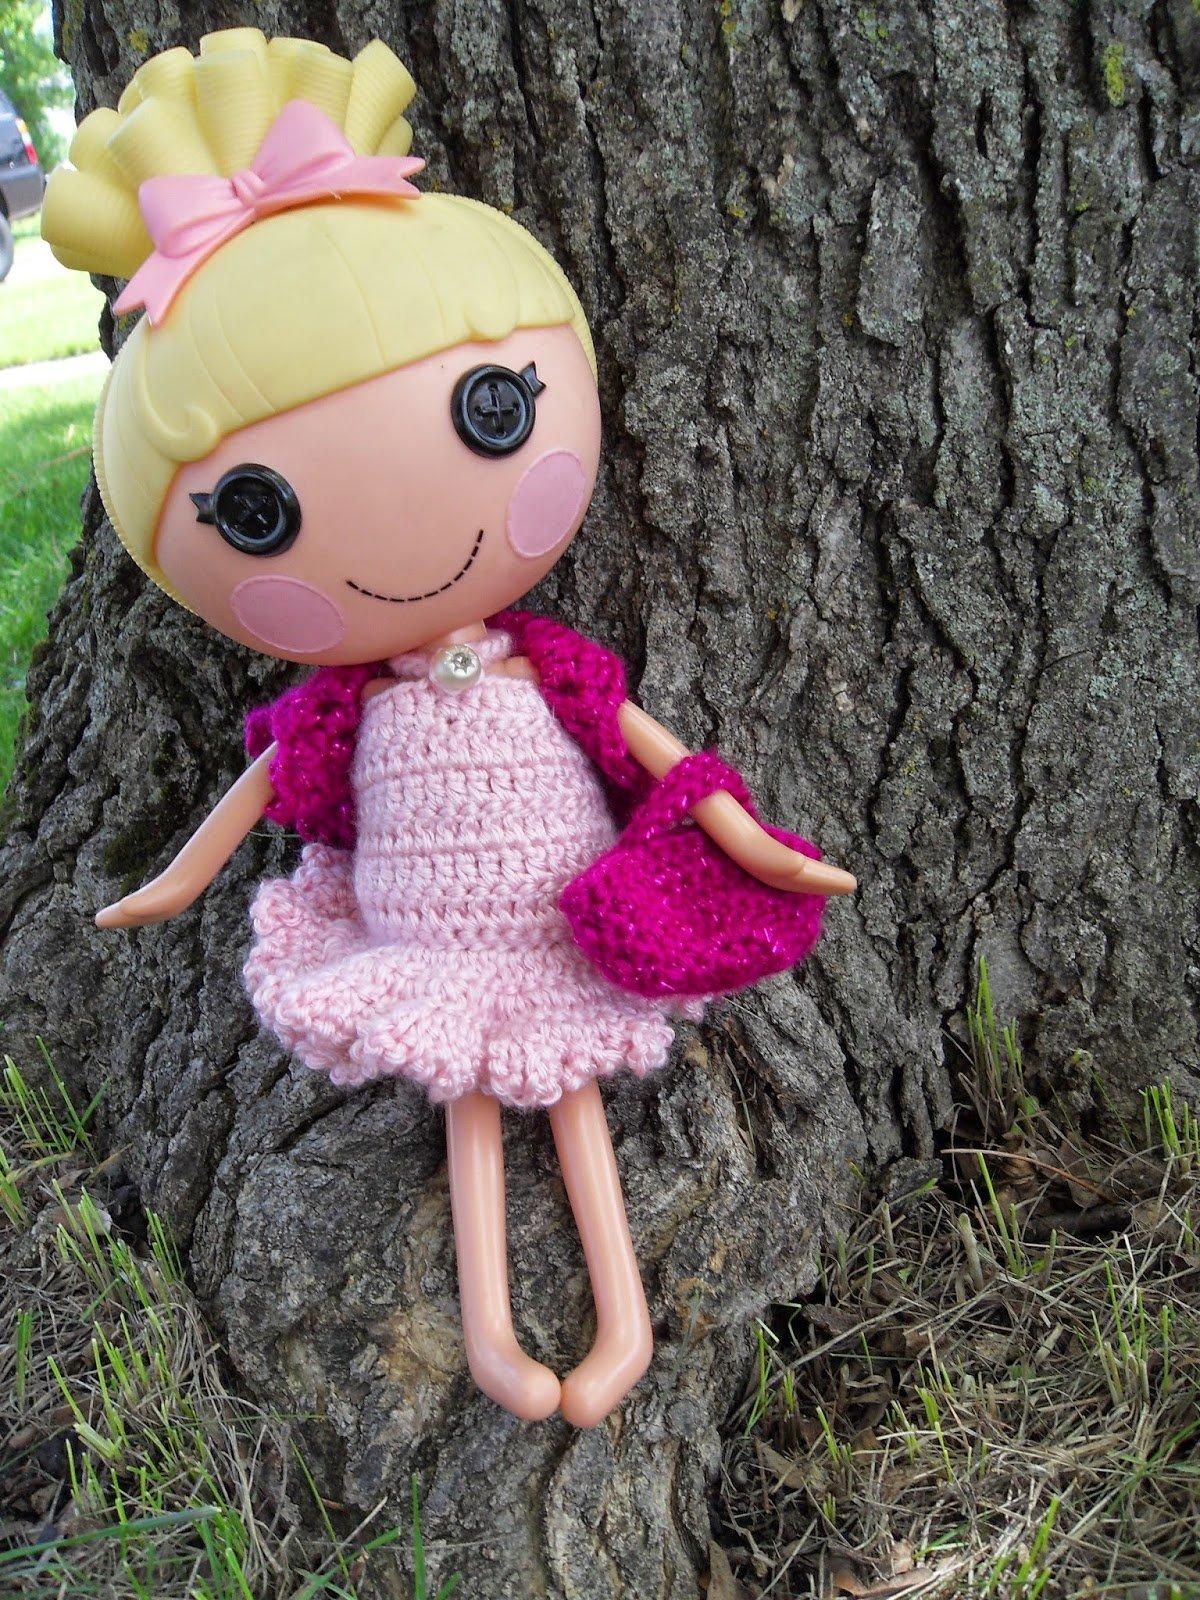 LaLa Loopsy Lacy Shrug/Bolero and Purse by Manda Proell of MandaLynn's Crochet Treasures